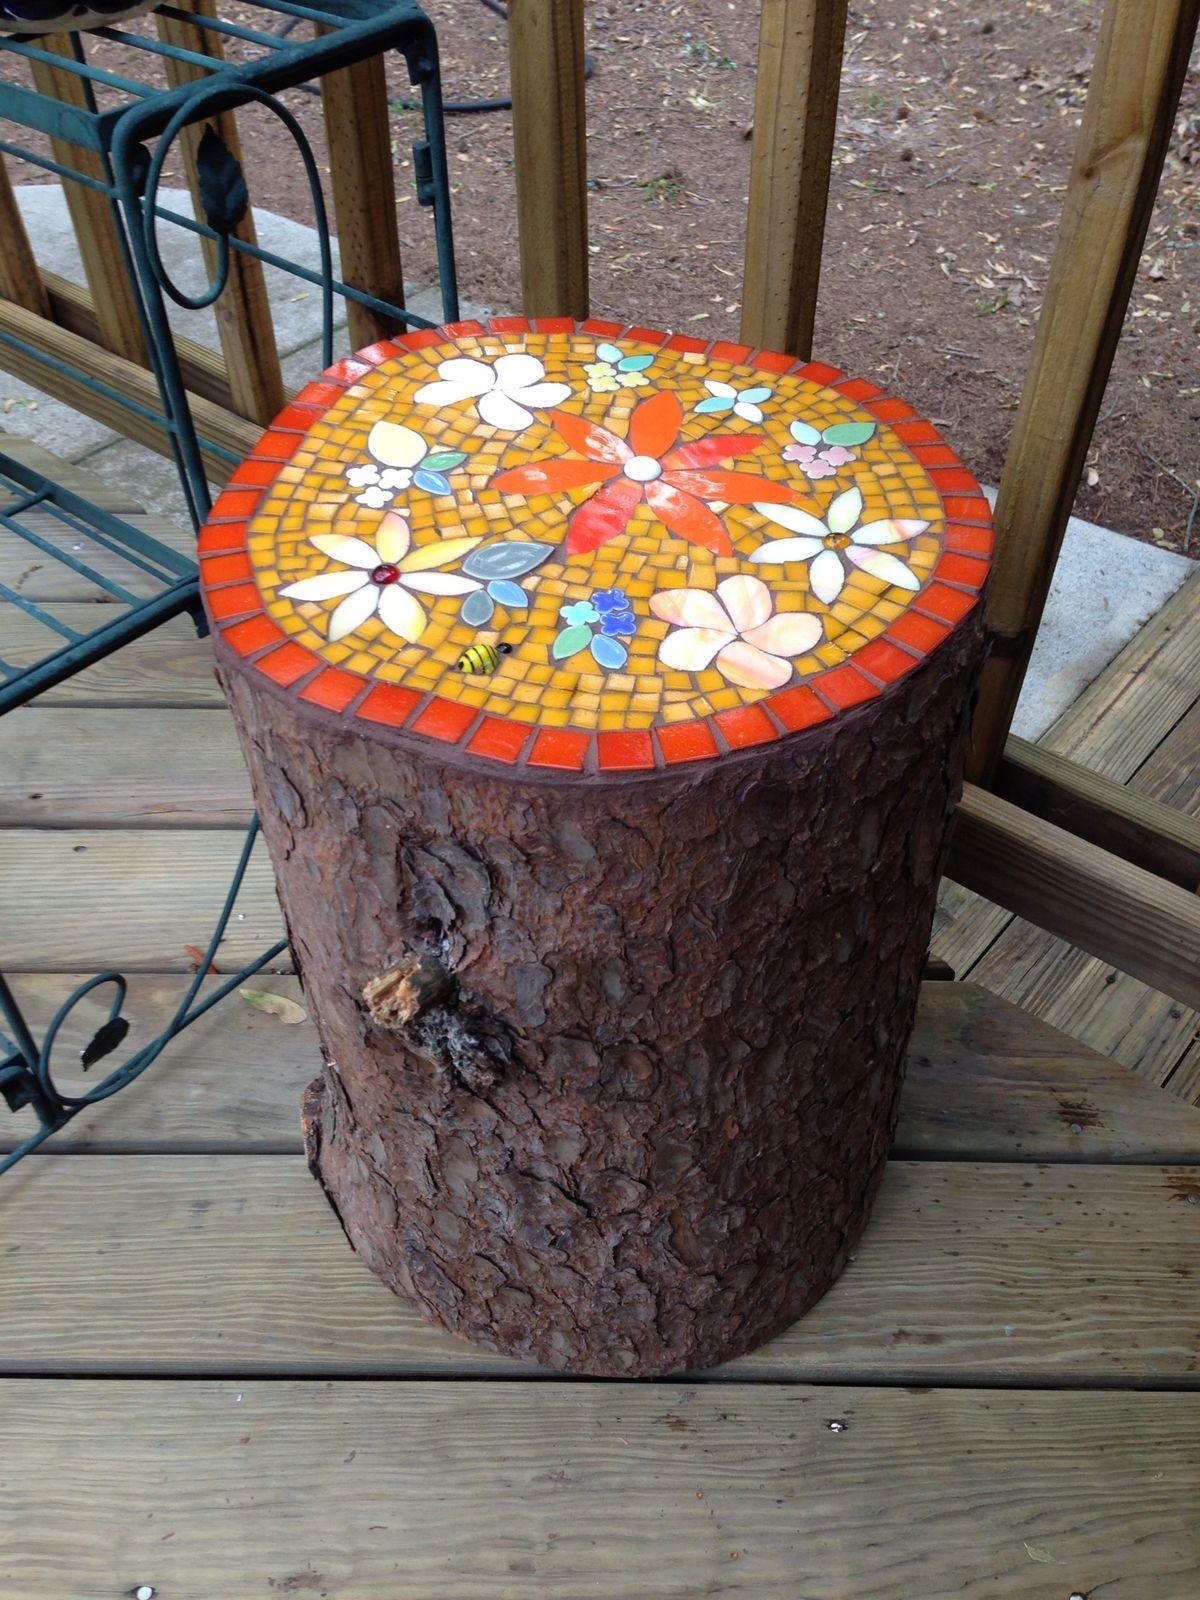 1 200 1 600 pixels mozaik pinterest mosaik. Black Bedroom Furniture Sets. Home Design Ideas